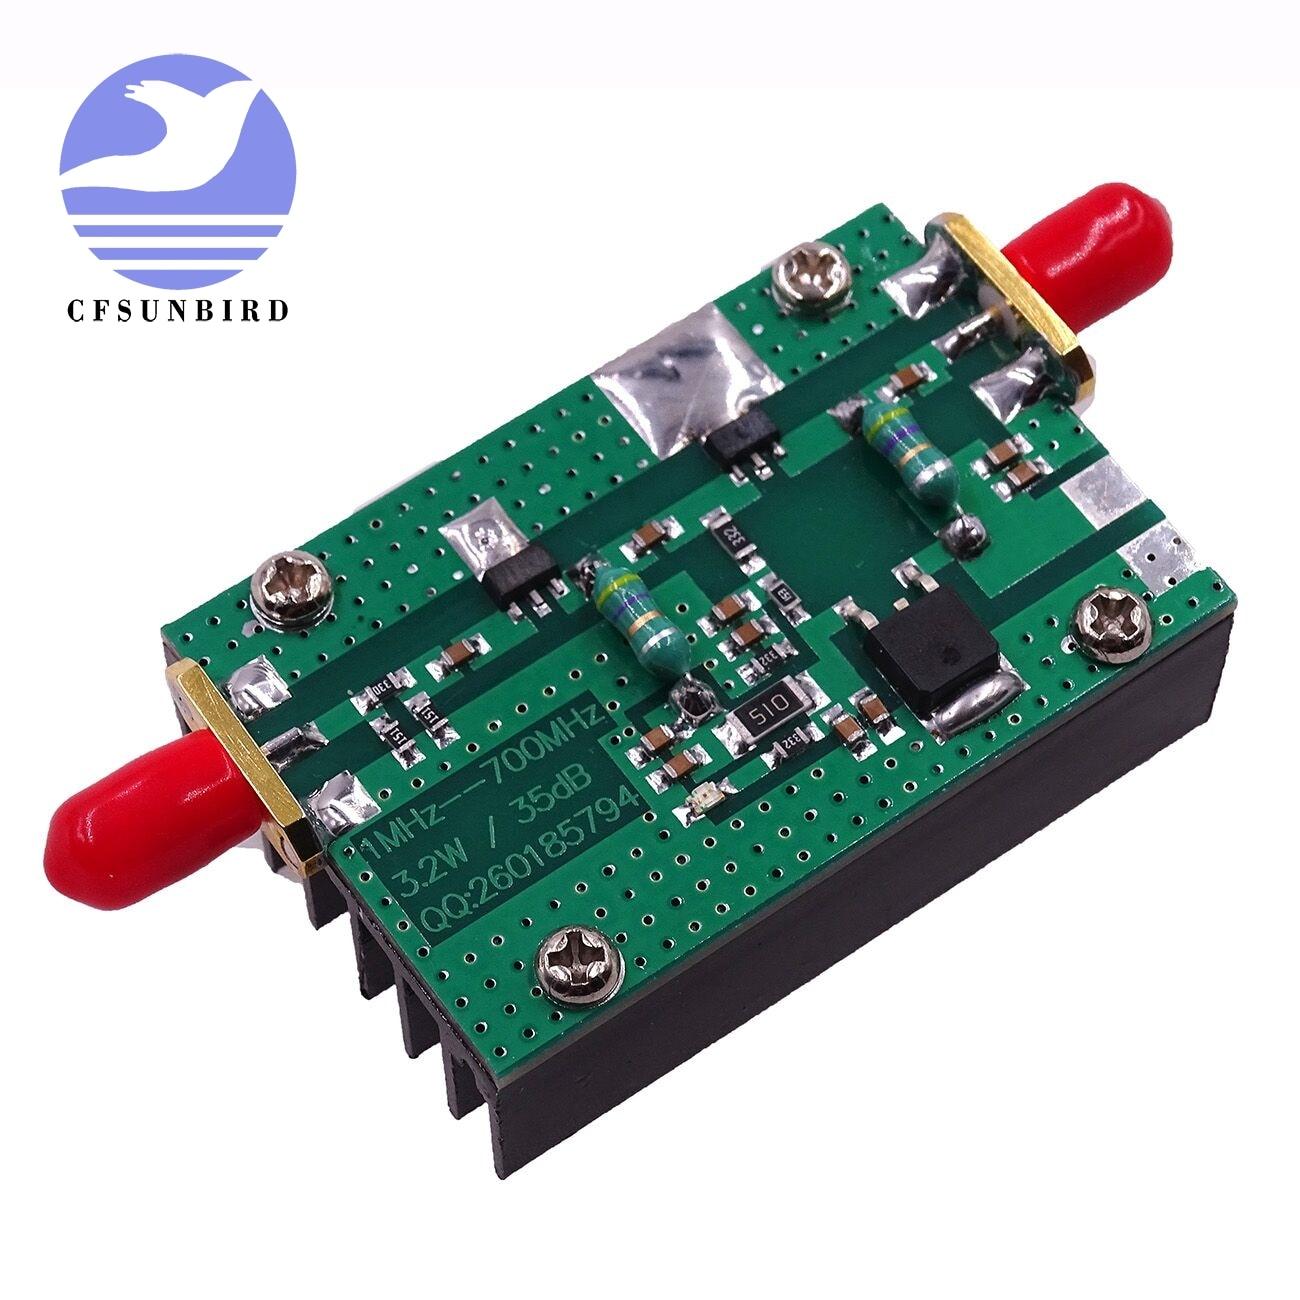 Toptan Sat Powered Rf Galerisi Dk Fiyattan Satn Aln 100w Transmitter Power Amplifier 2sc2782 Aliexpresscomda Bir Sr